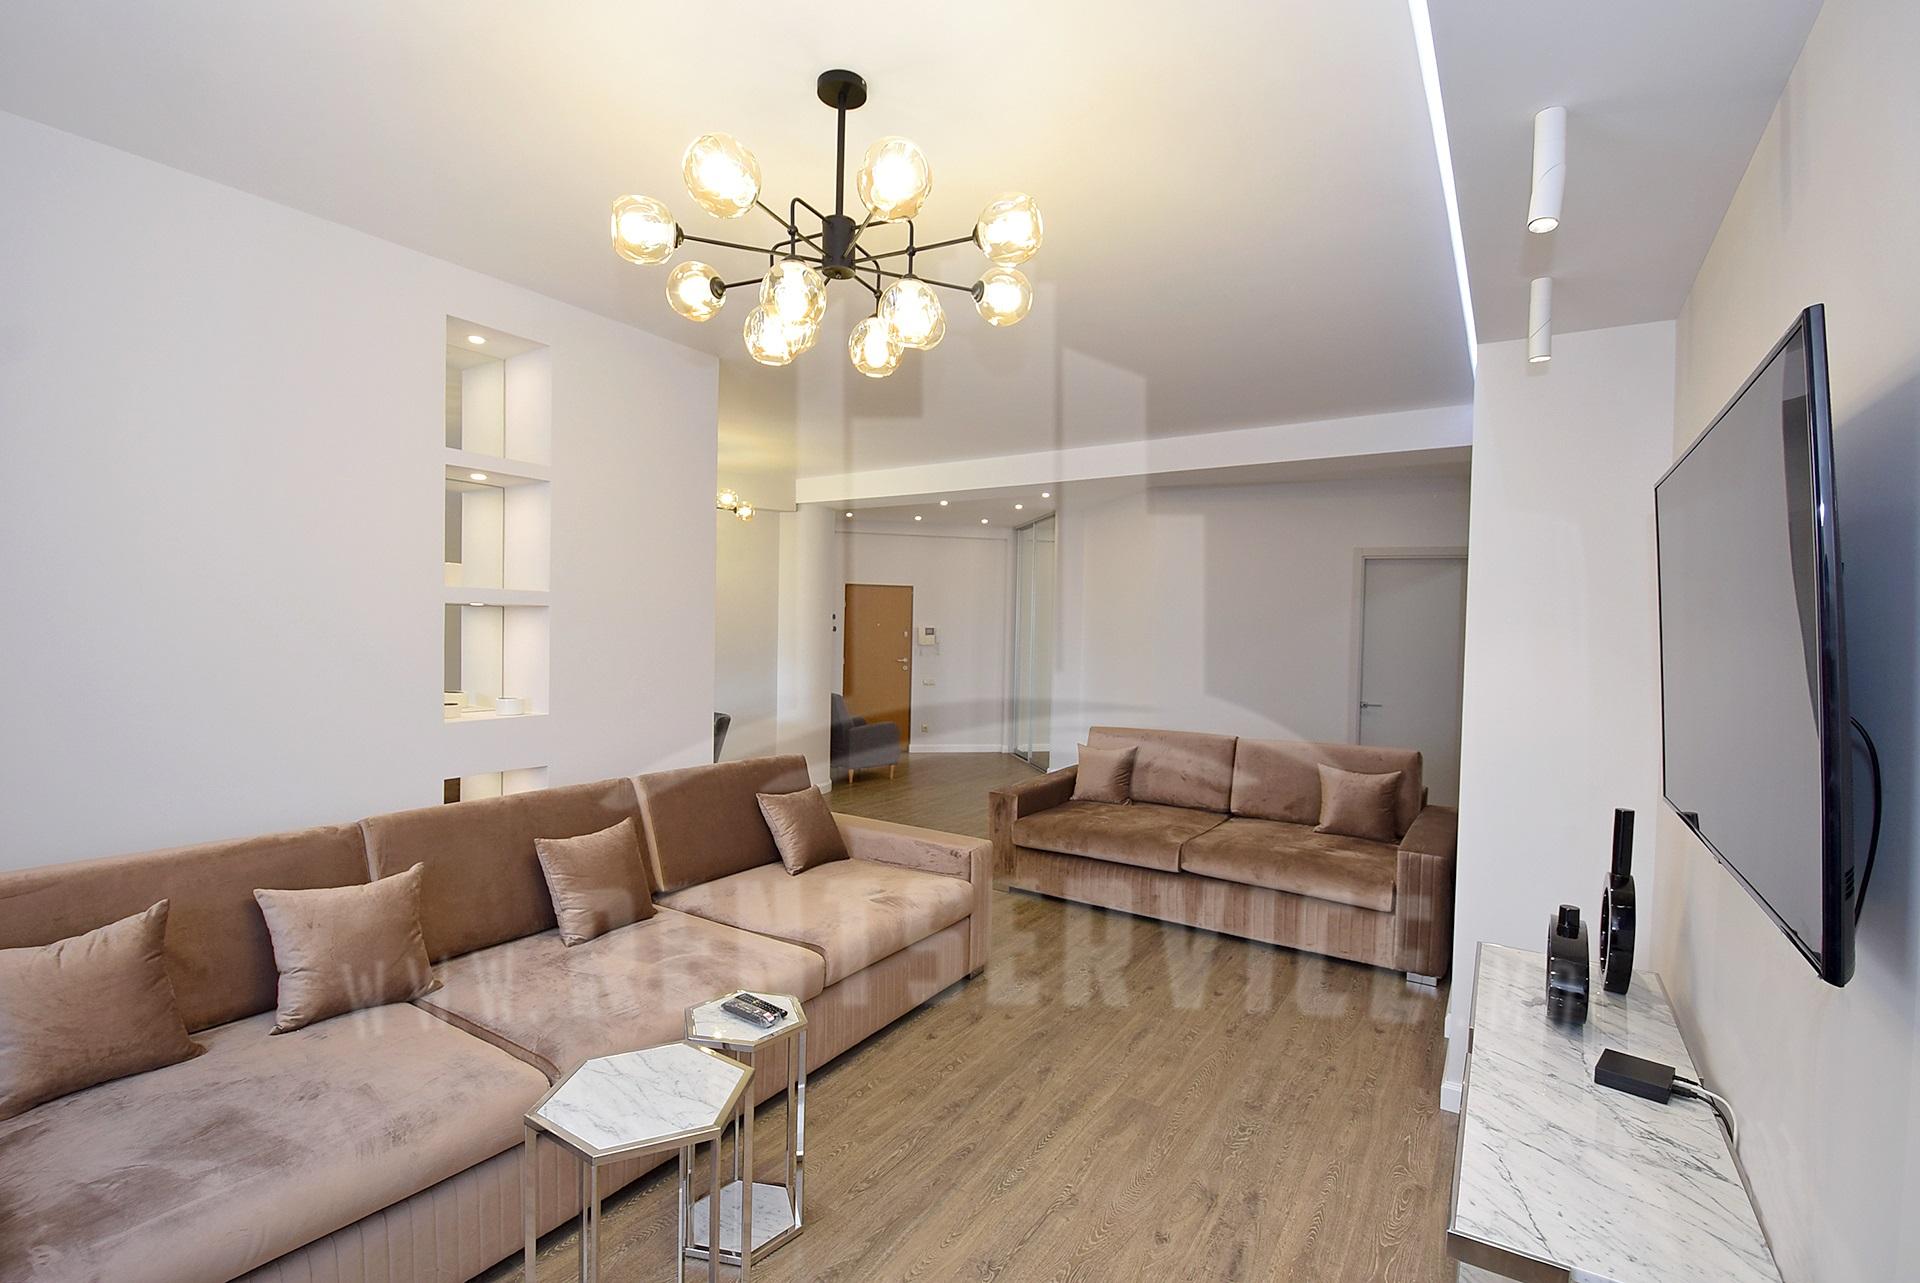 285_apartment_1.JPG